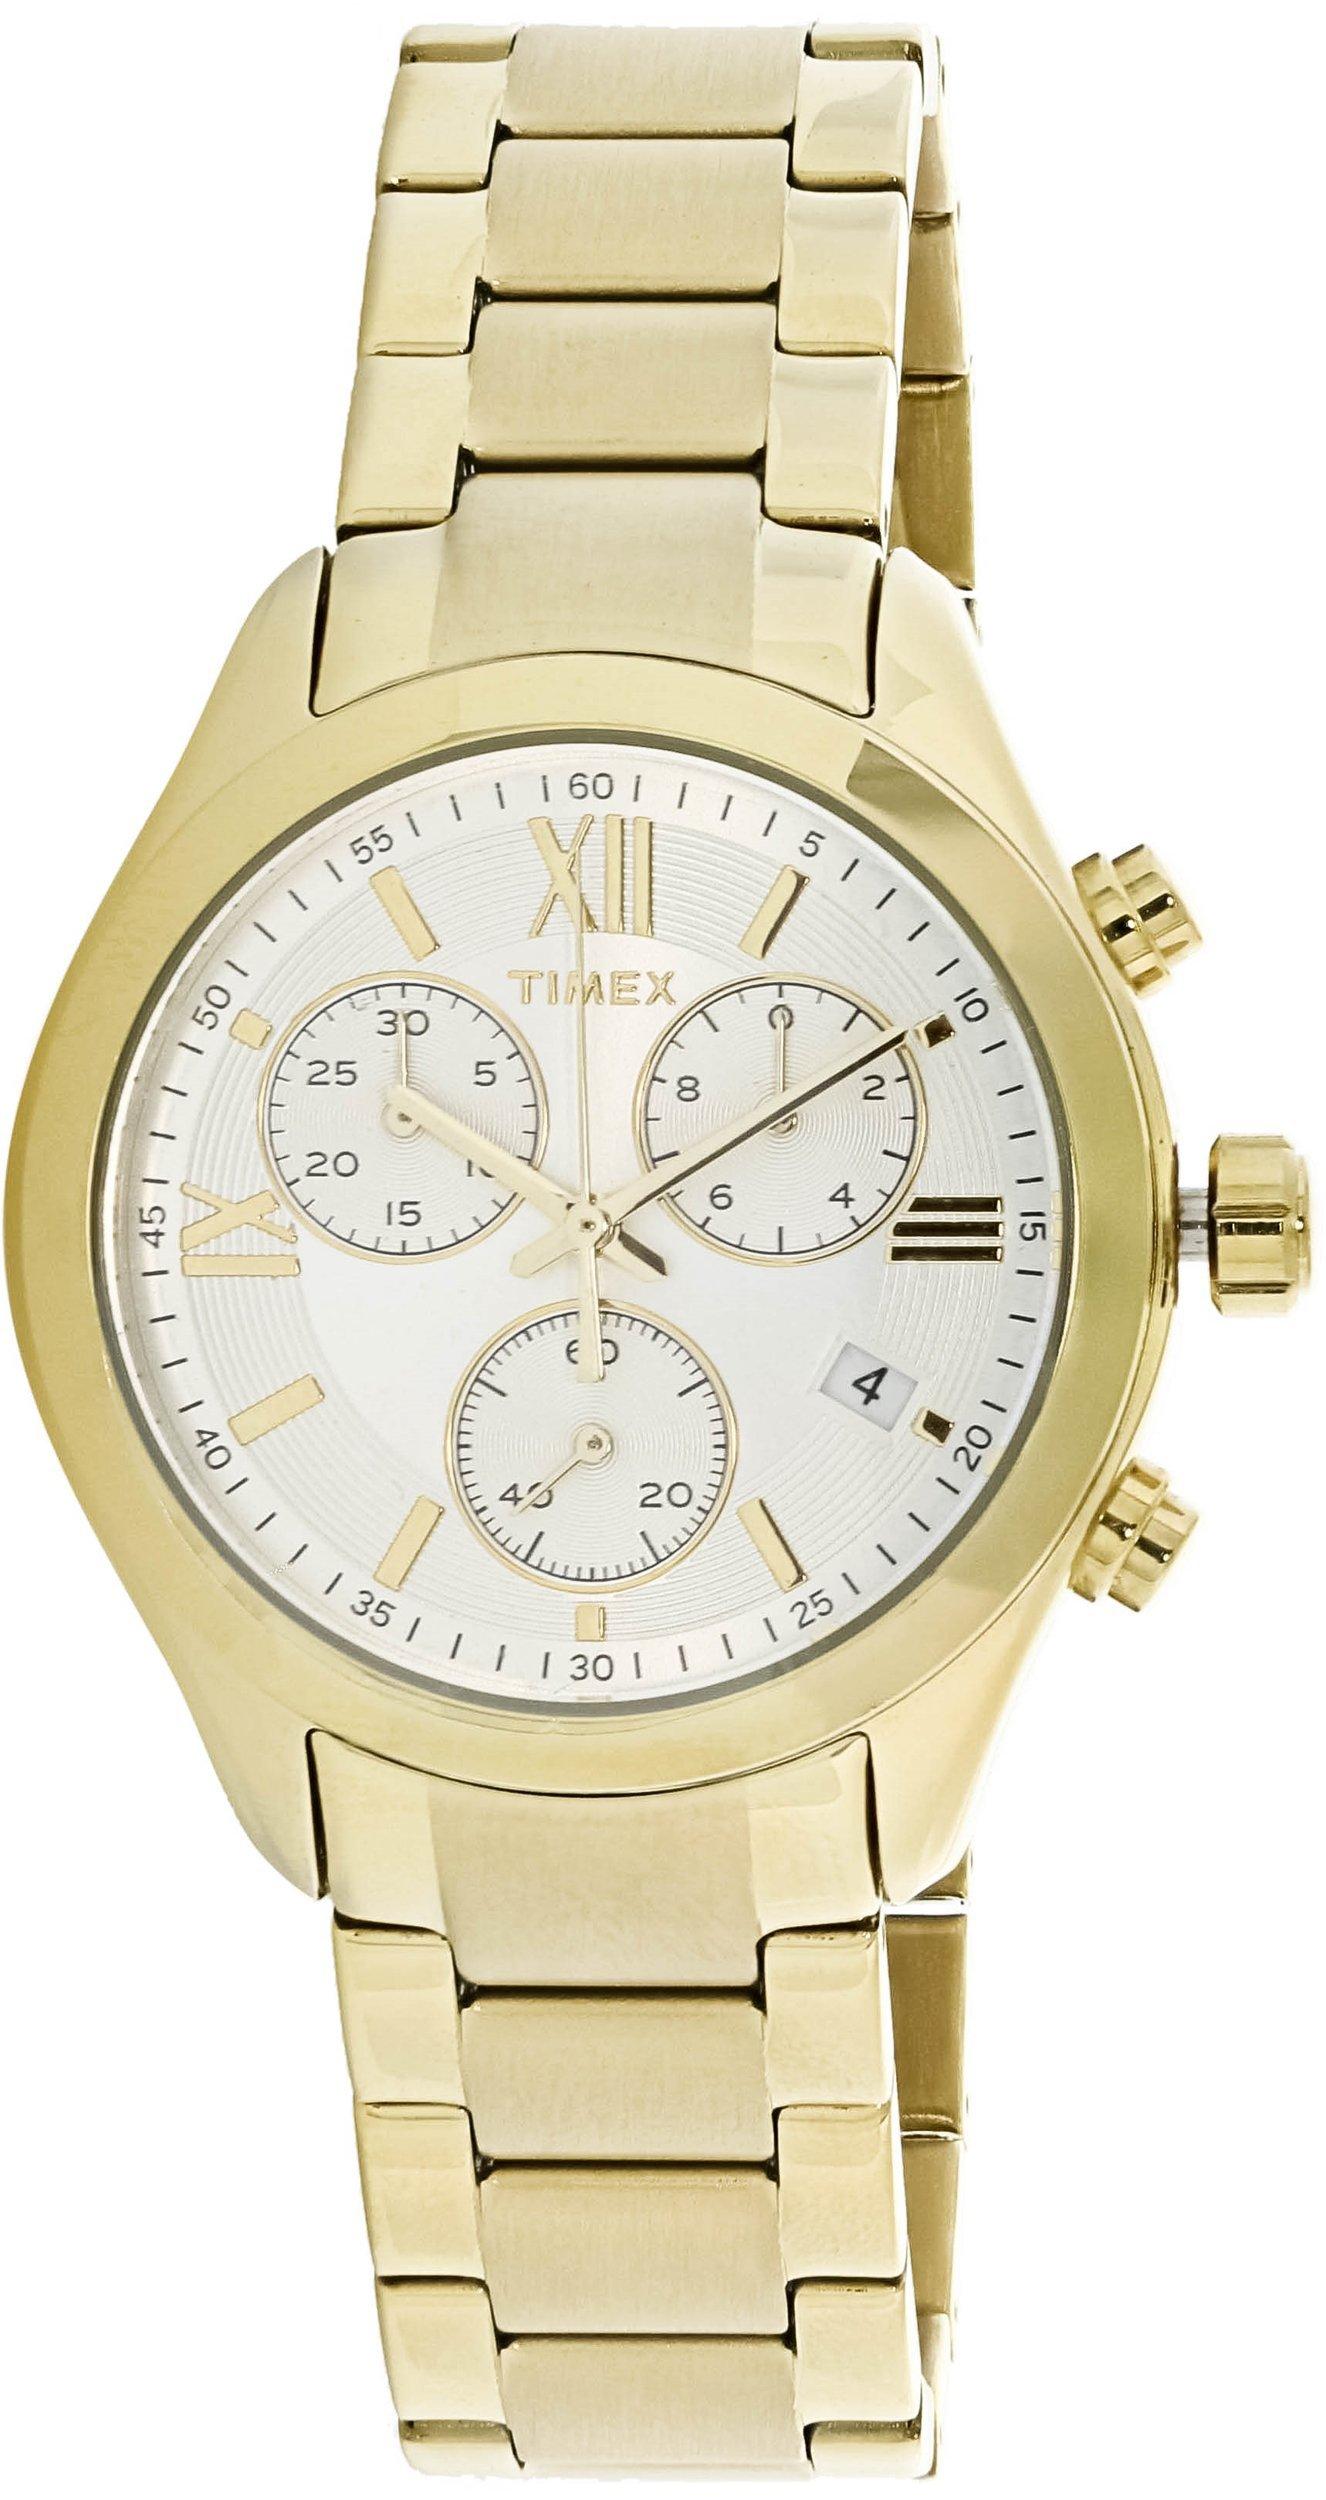 Timex Women's Miami Chronograph TW2P93700 Gold Stainless-Steel Quartz Fashion Watch by Timex